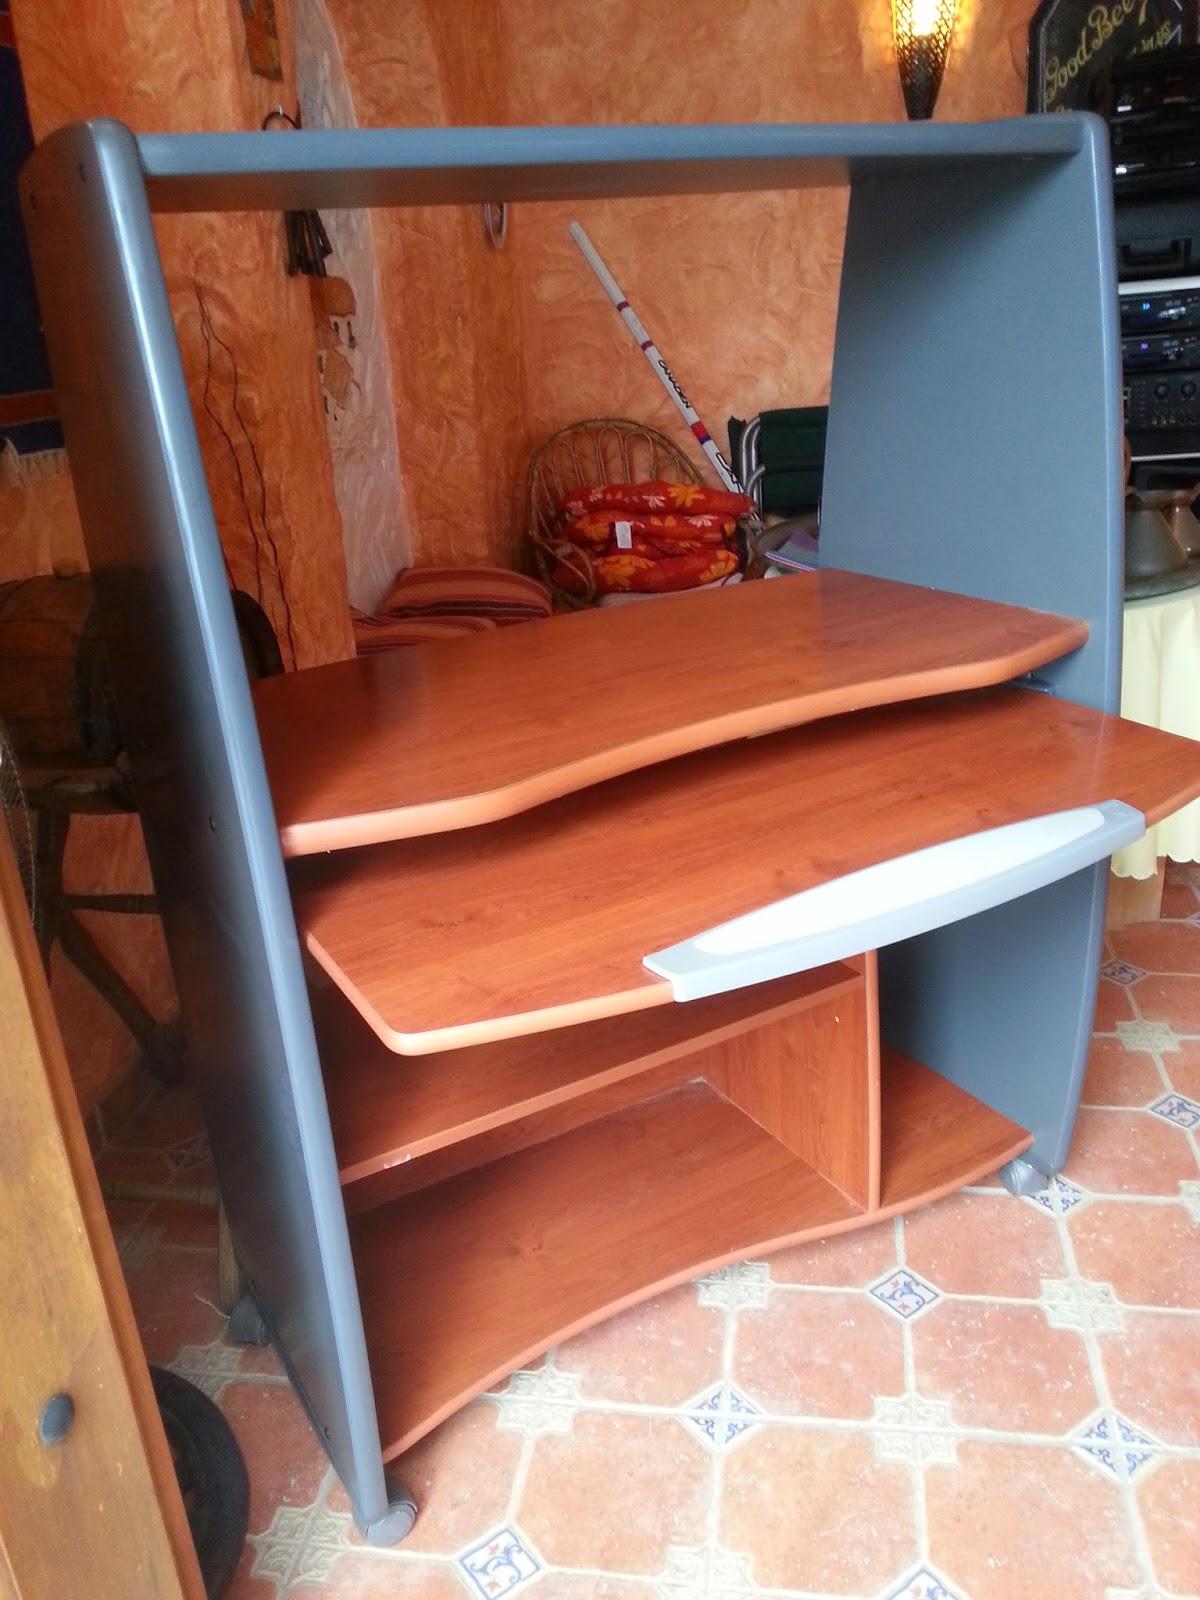 Digame For sale puter Desk